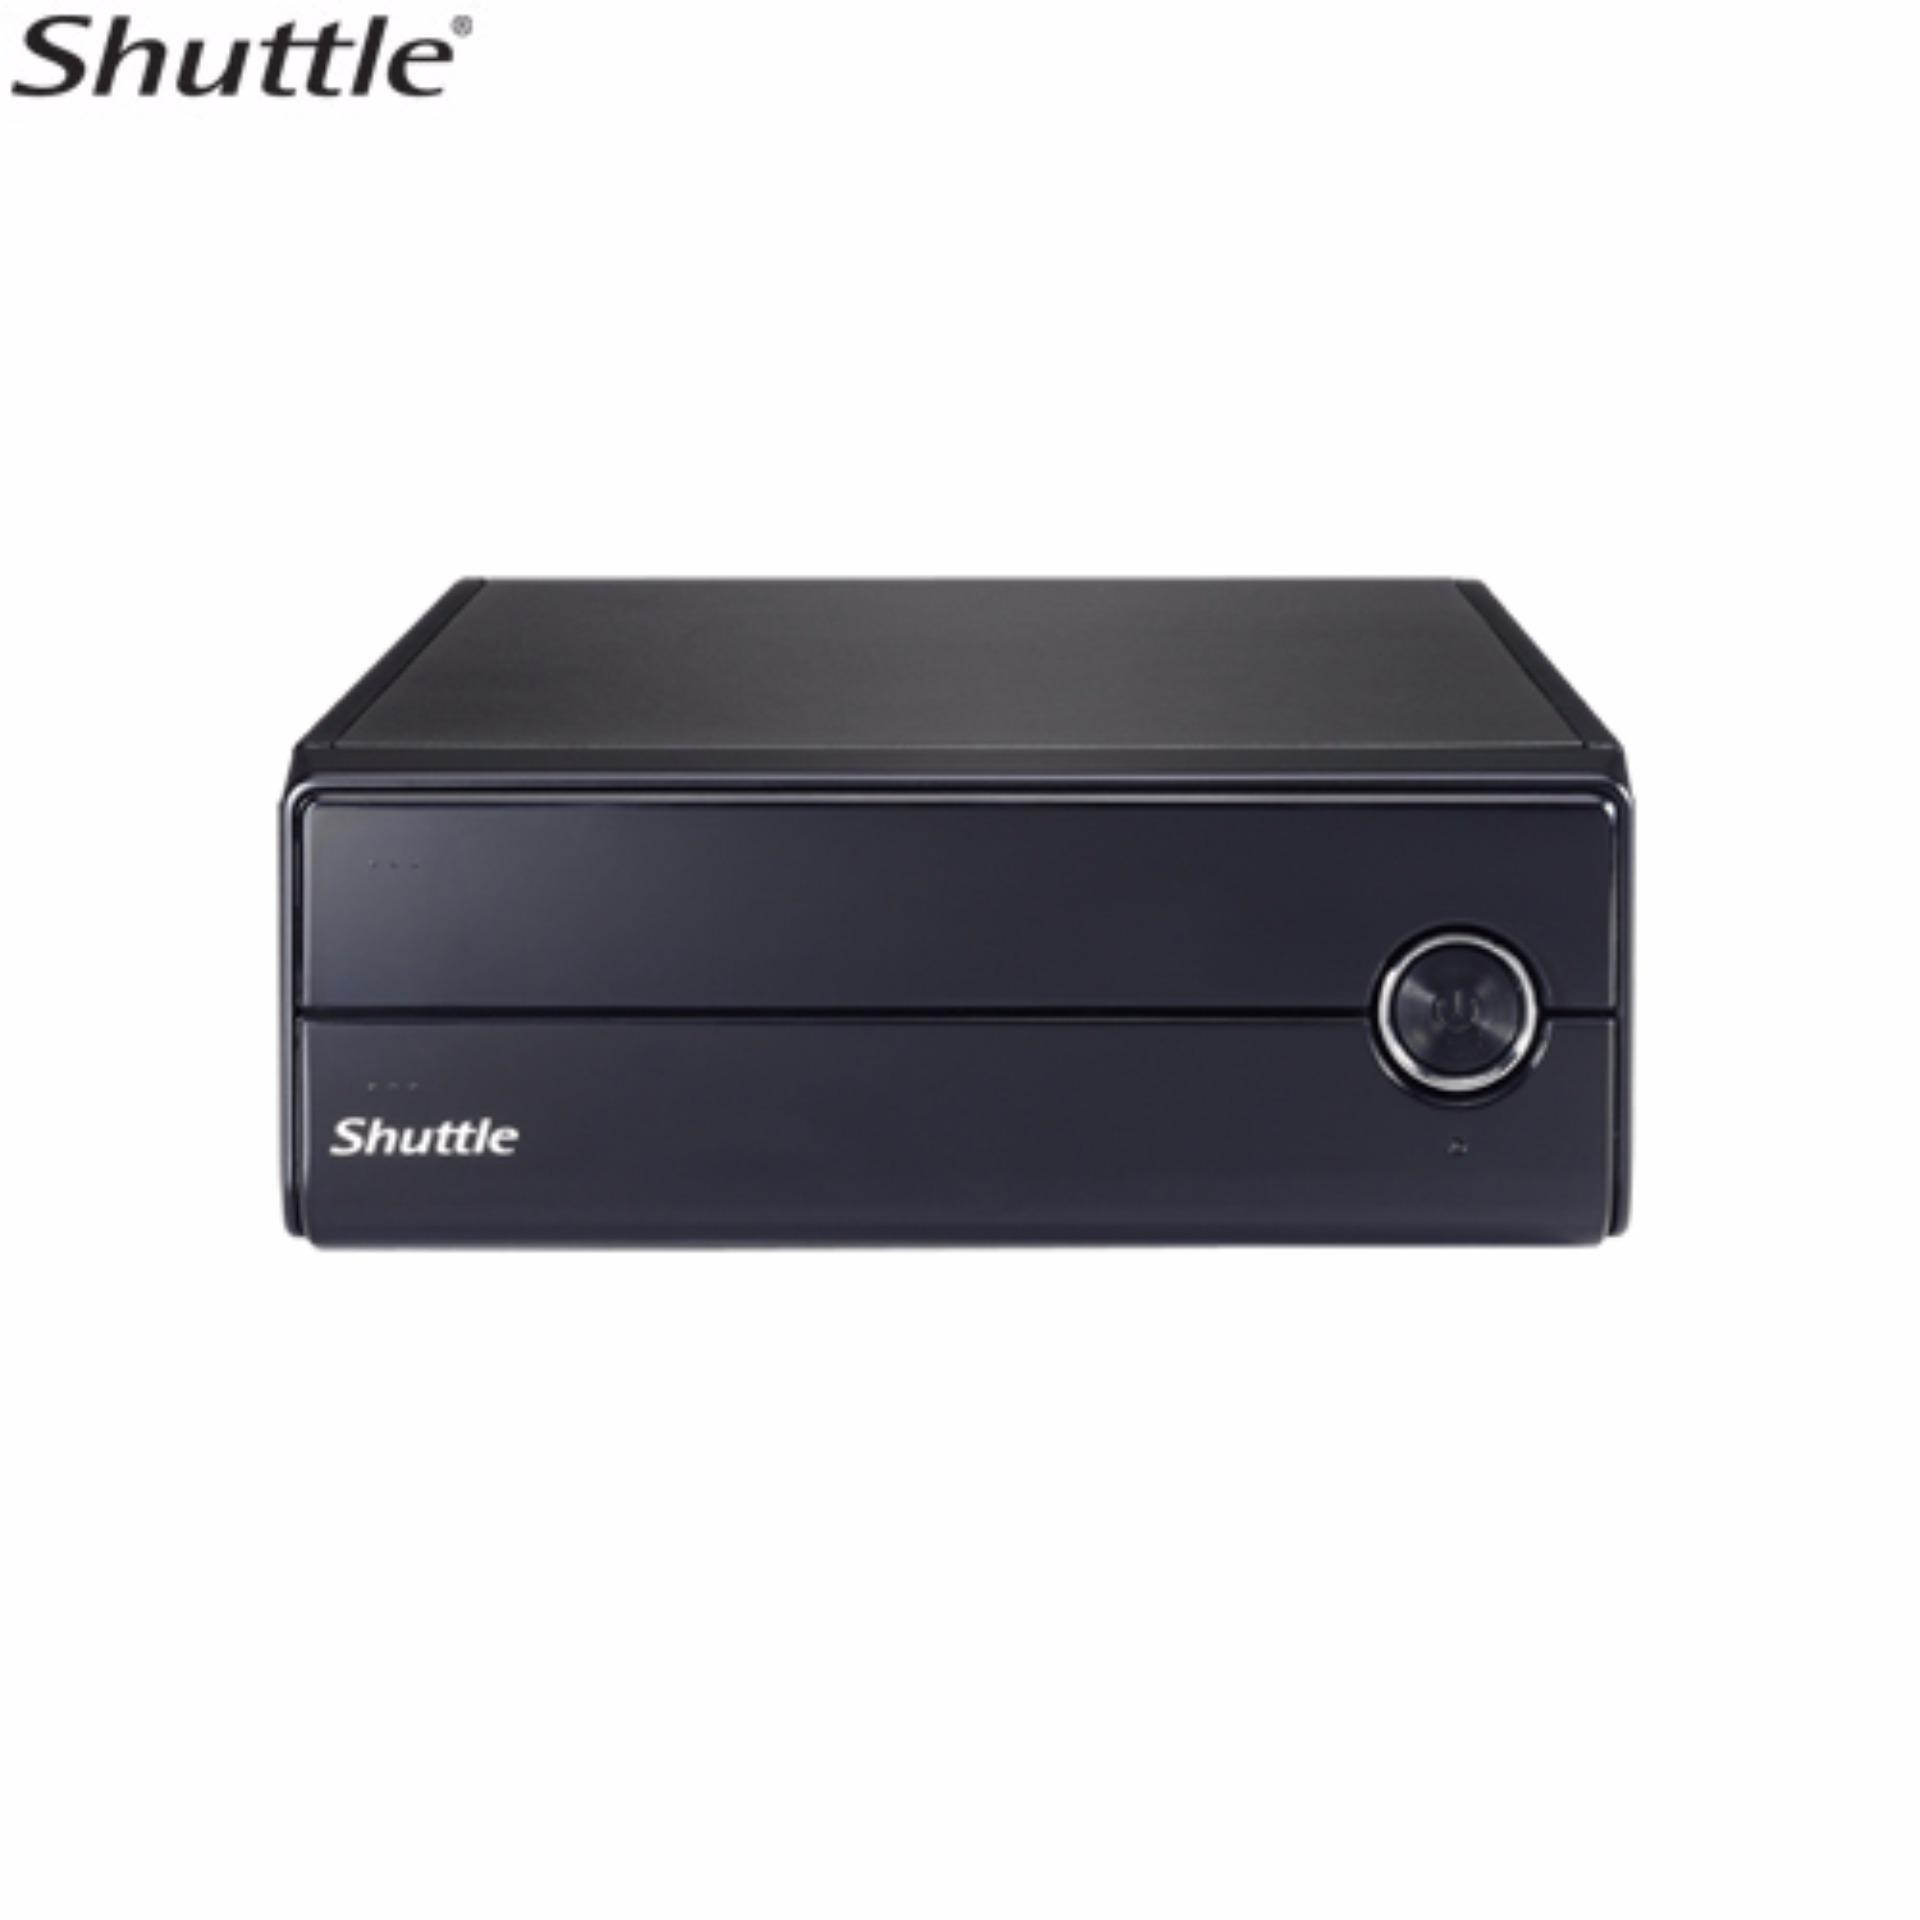 Shuttle XH170V Small Form Factor PC (Barebone)